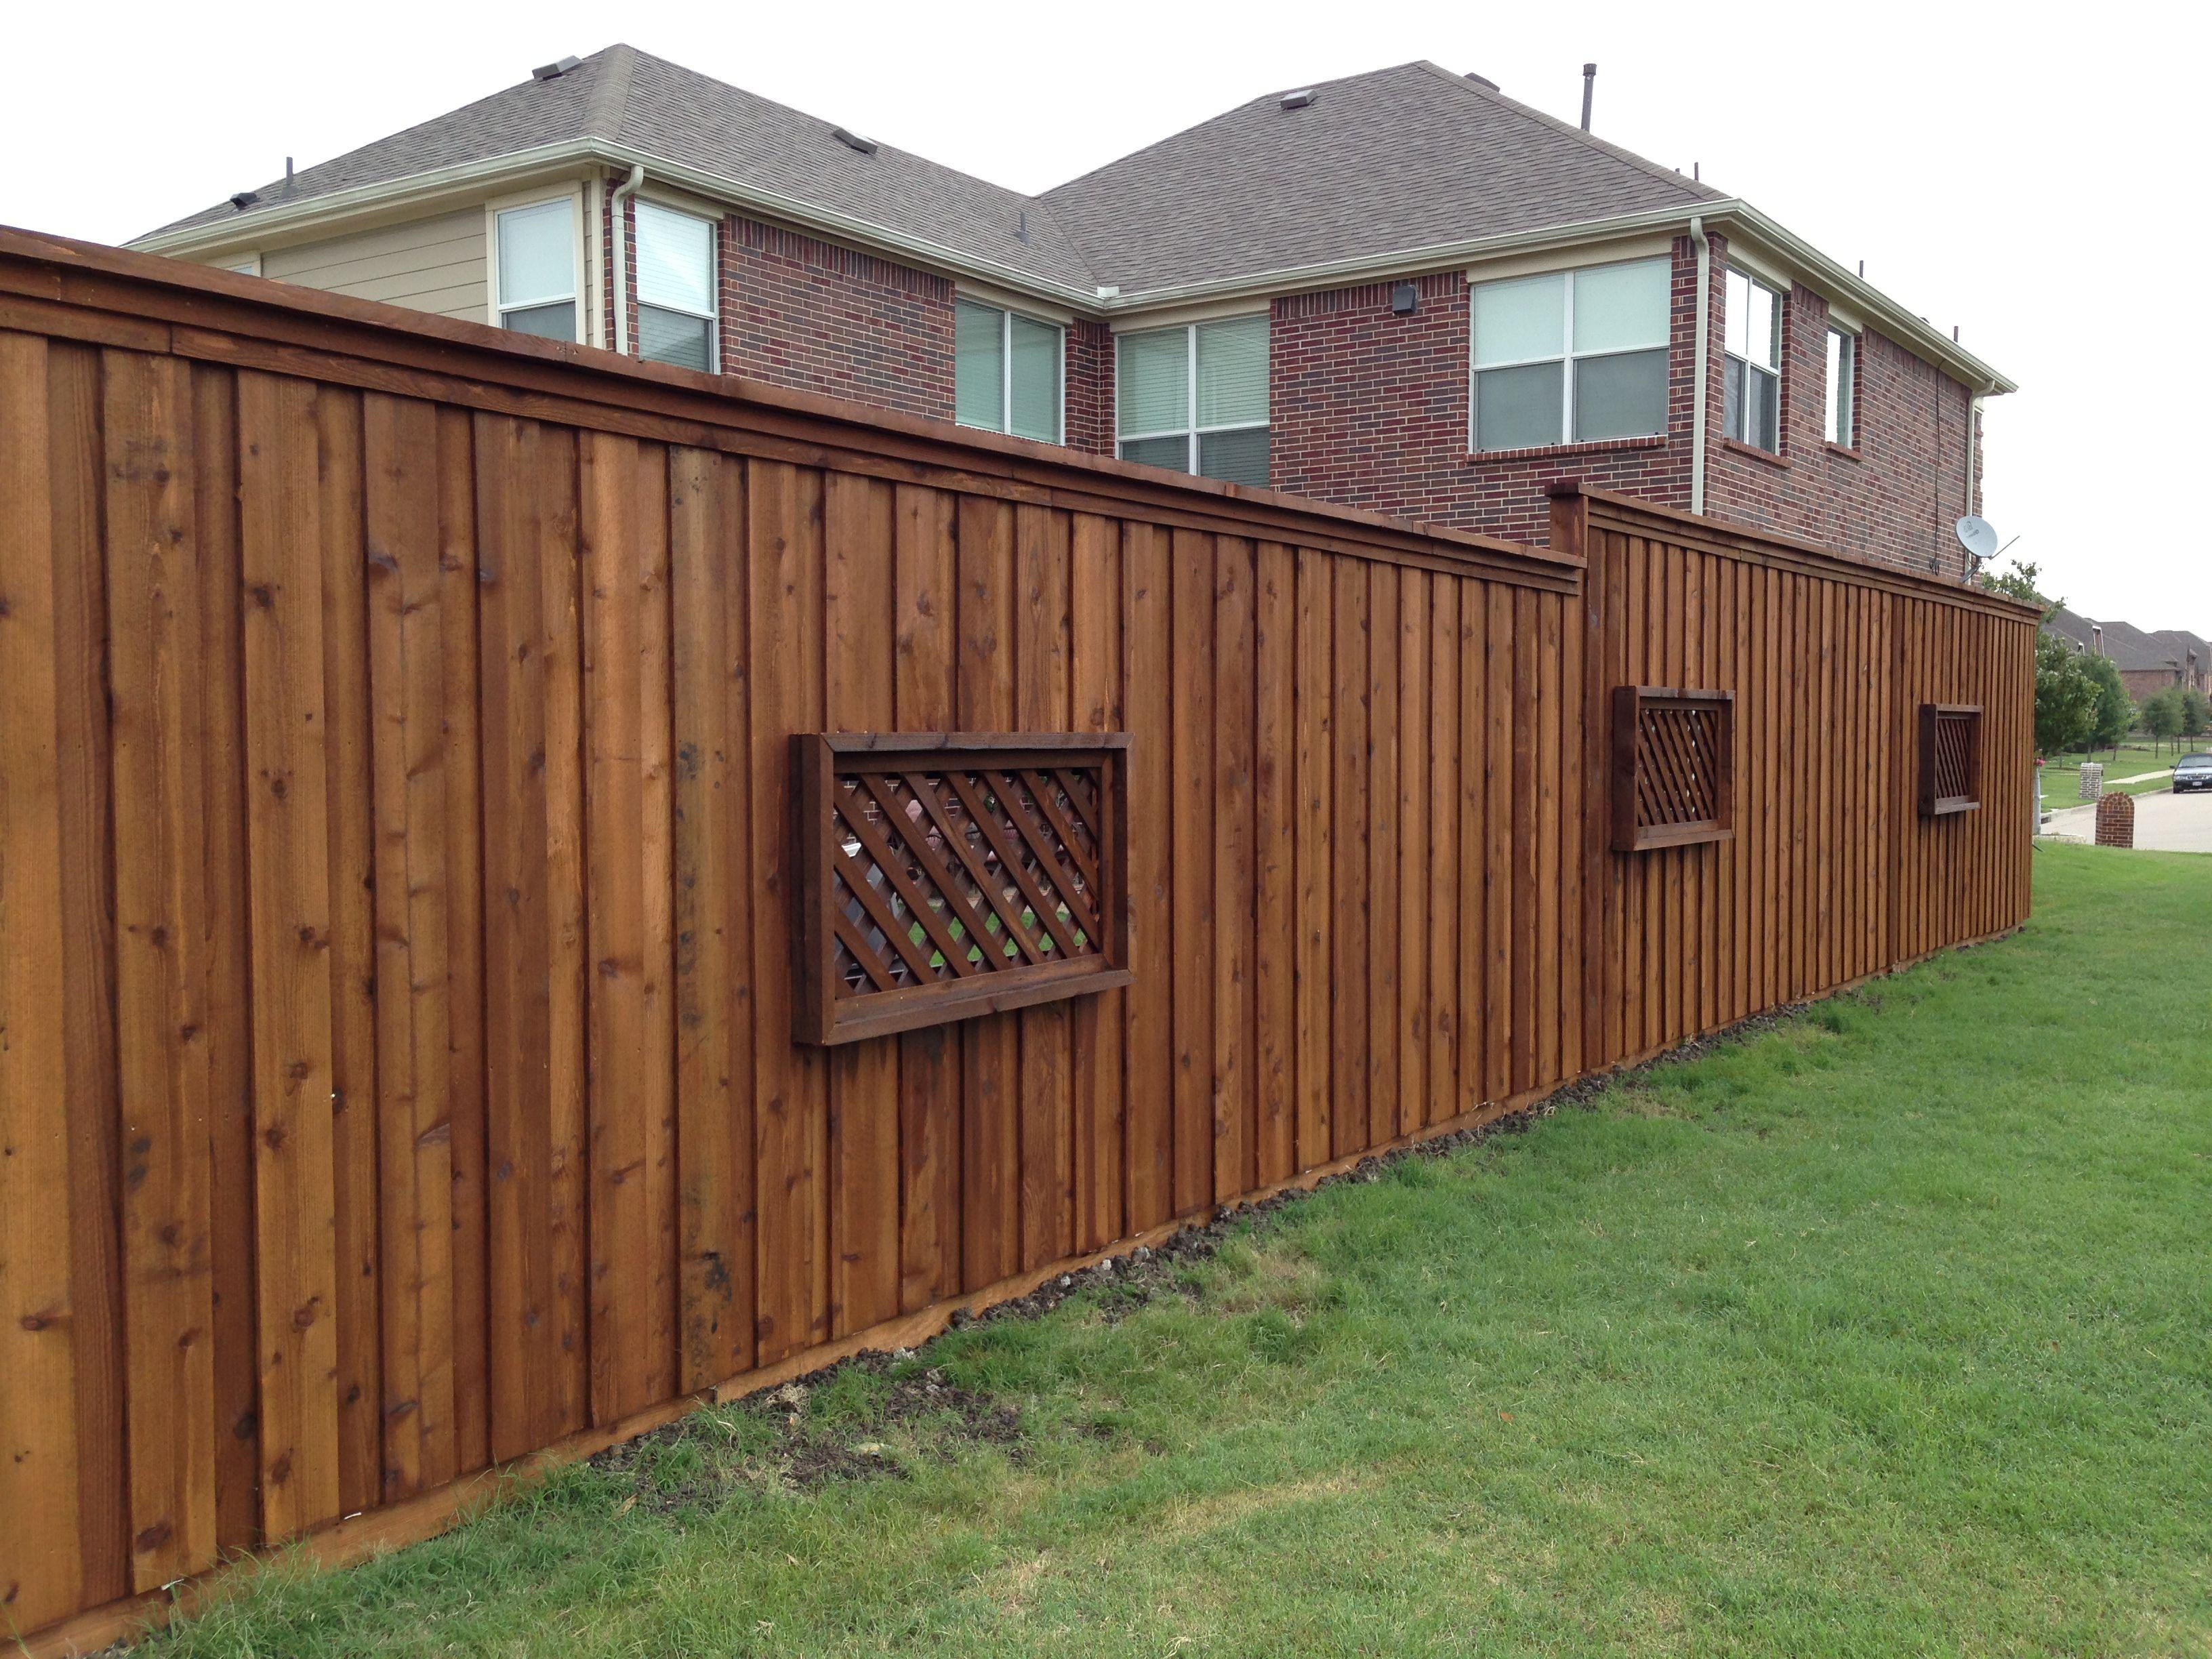 Lattice Fence Windows Outdoor Living Space Patio Outdoor Living Lattice Fence